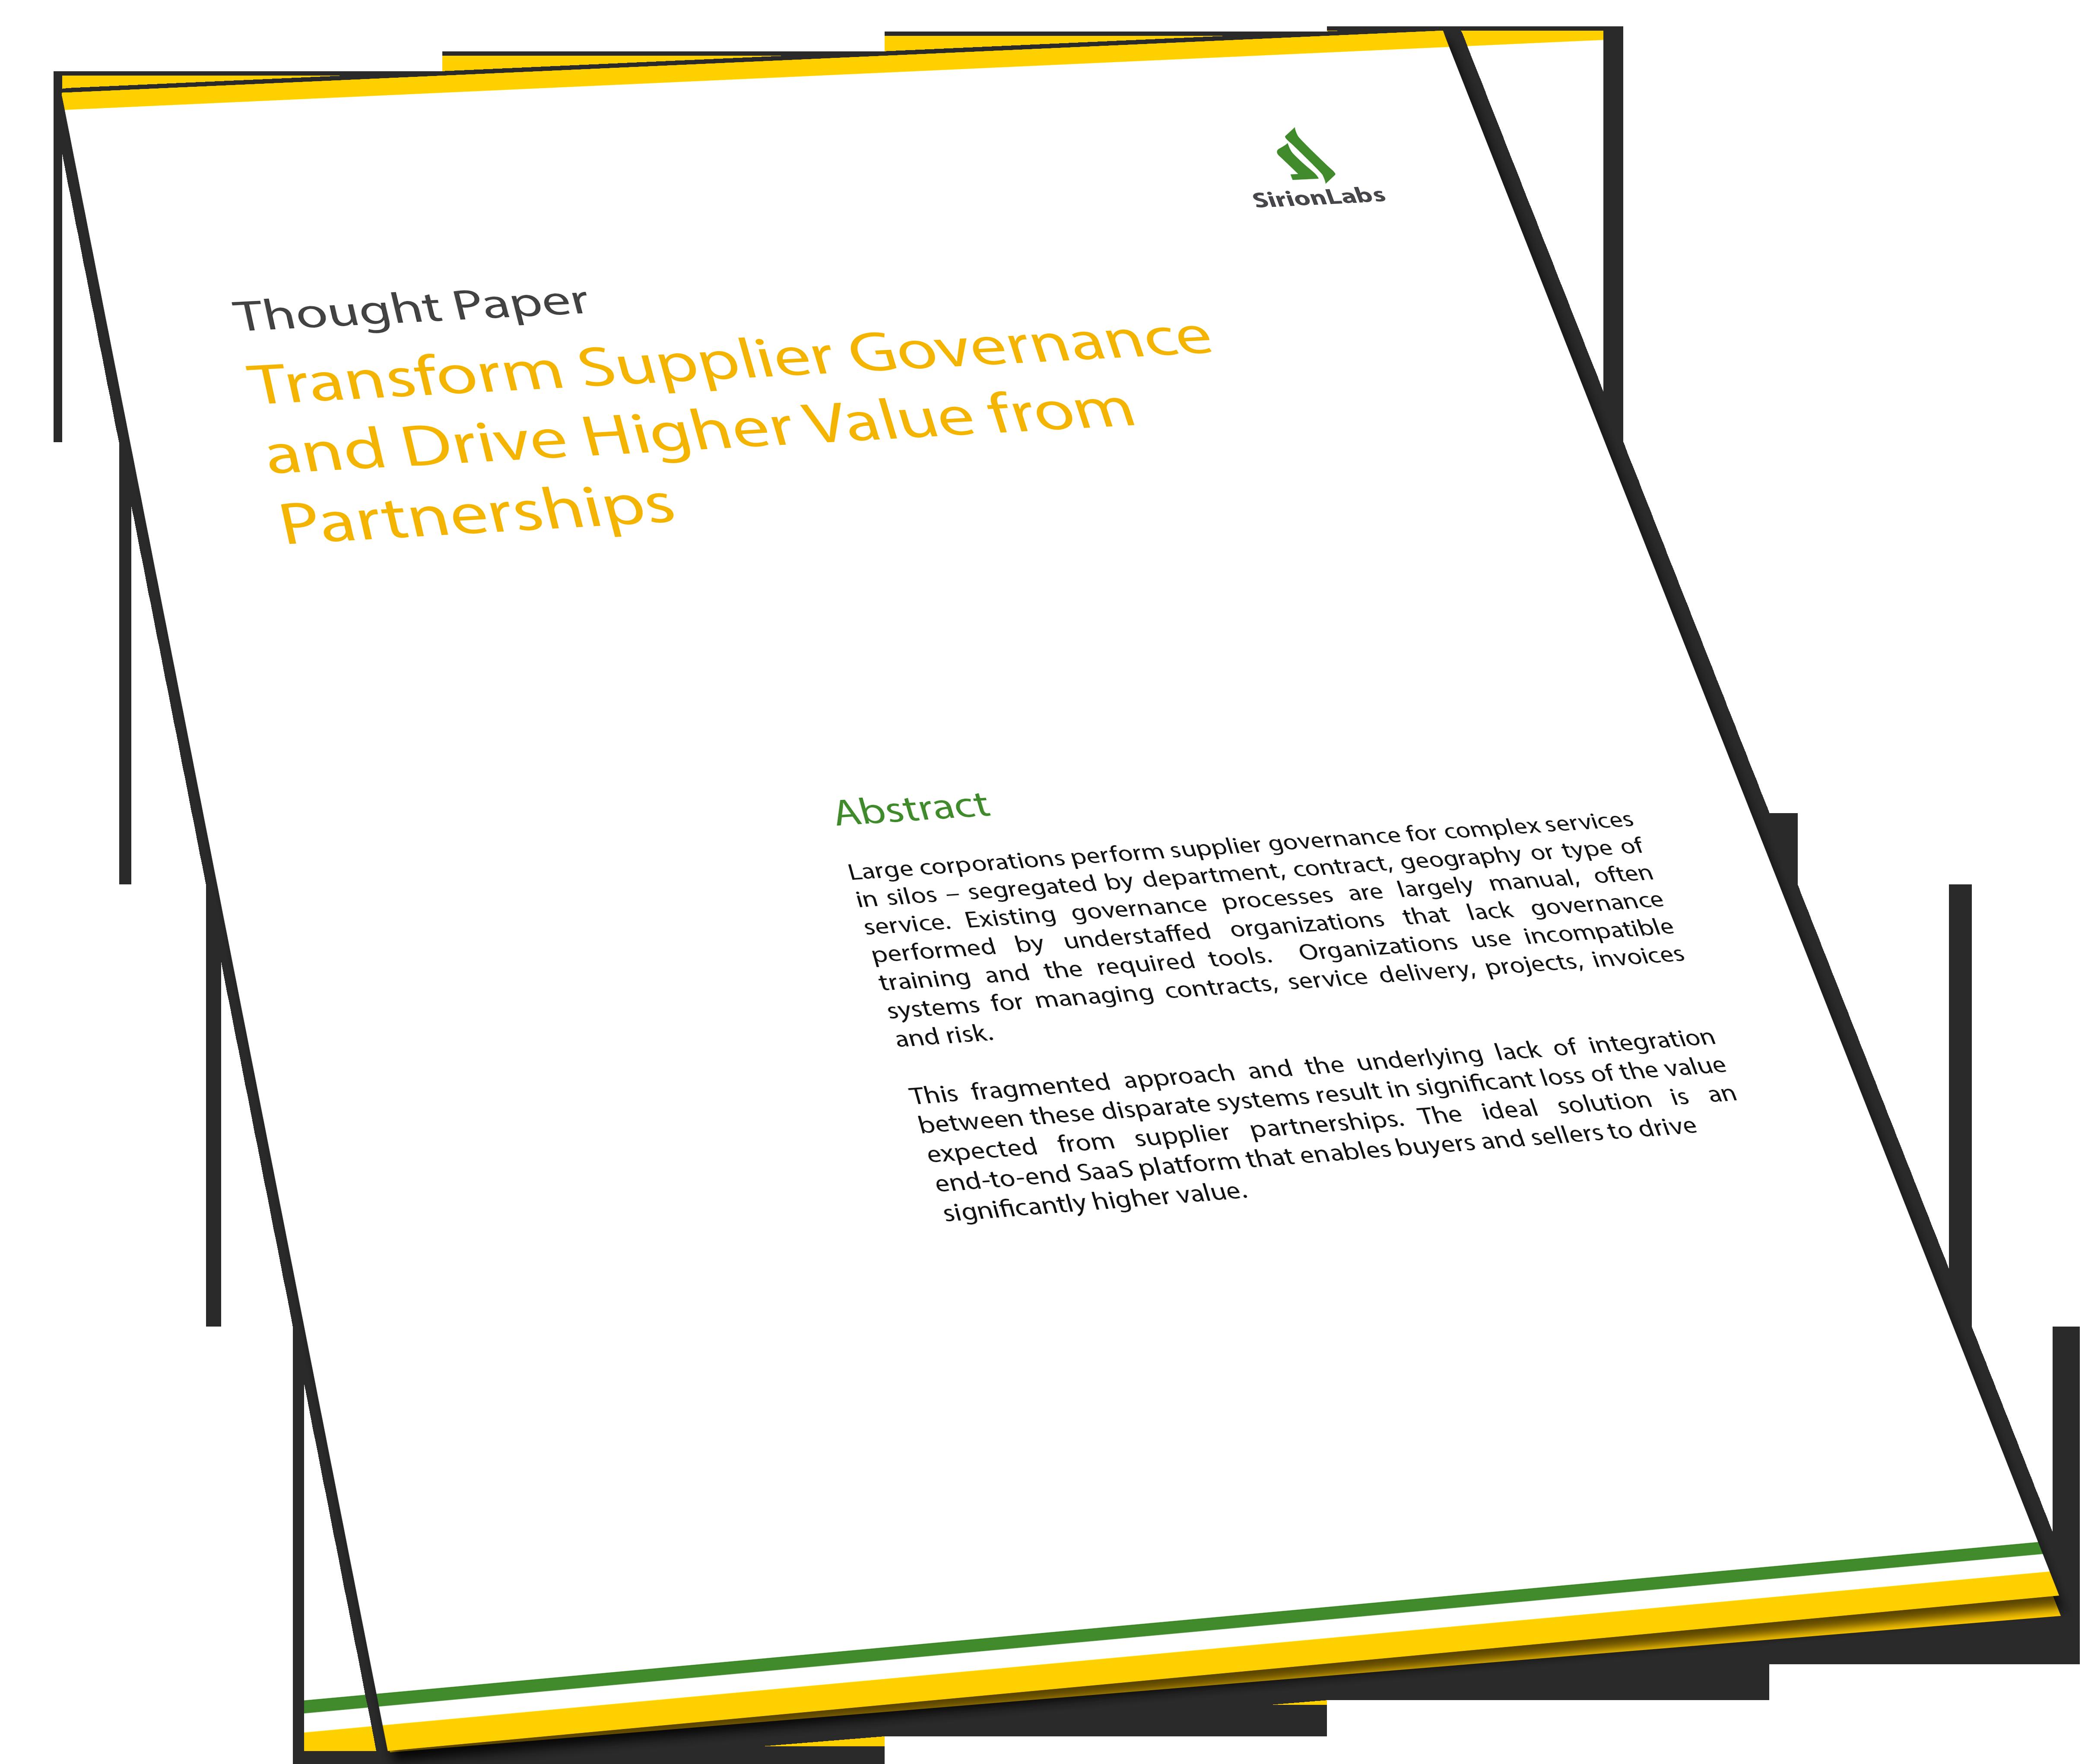 Whitepaper - Transform Supplier Governance